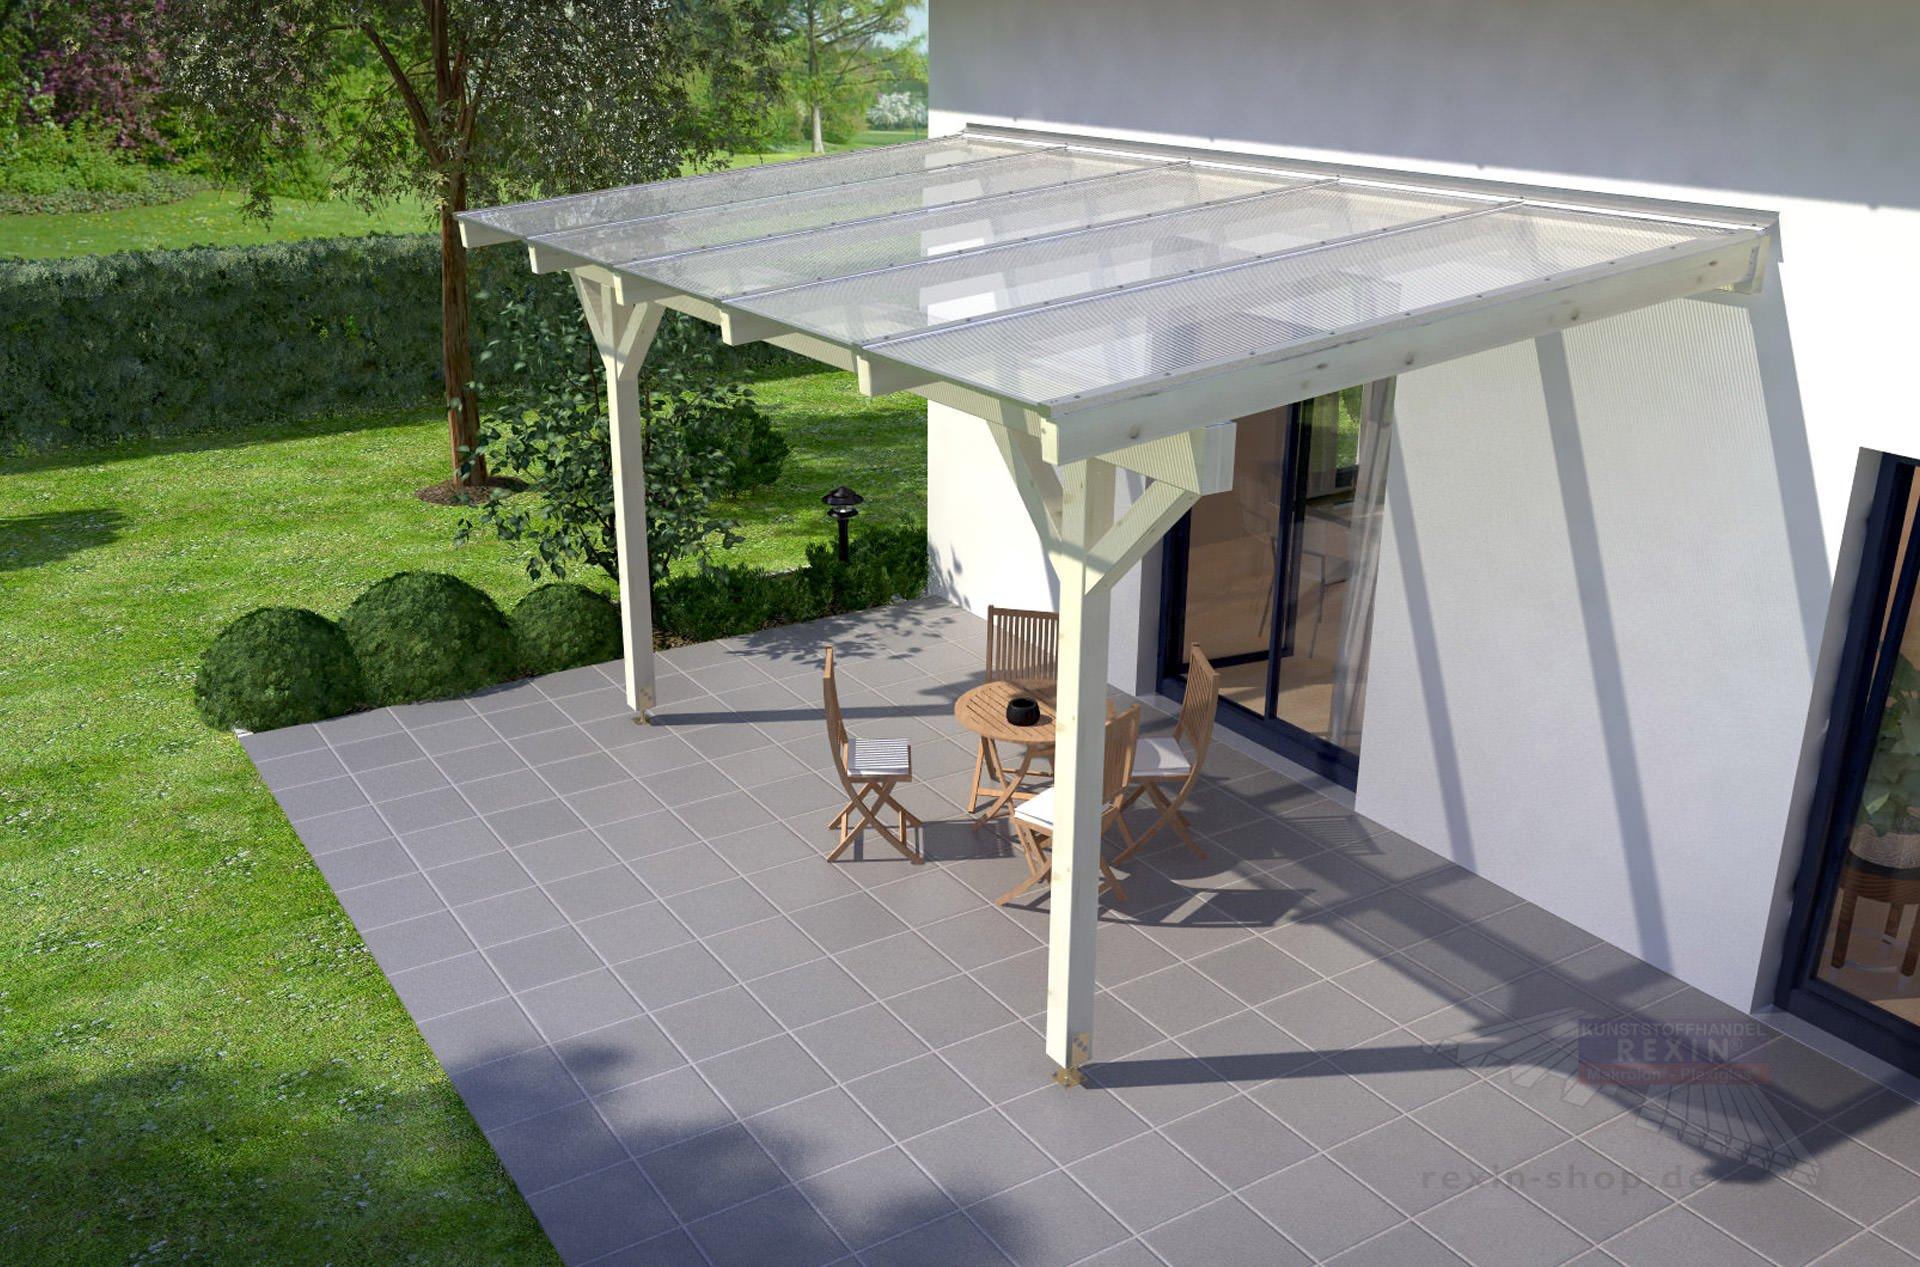 rexocomplete holz terrassenüberdachung 5m x 4m ▷ rexin-shop, Moderne